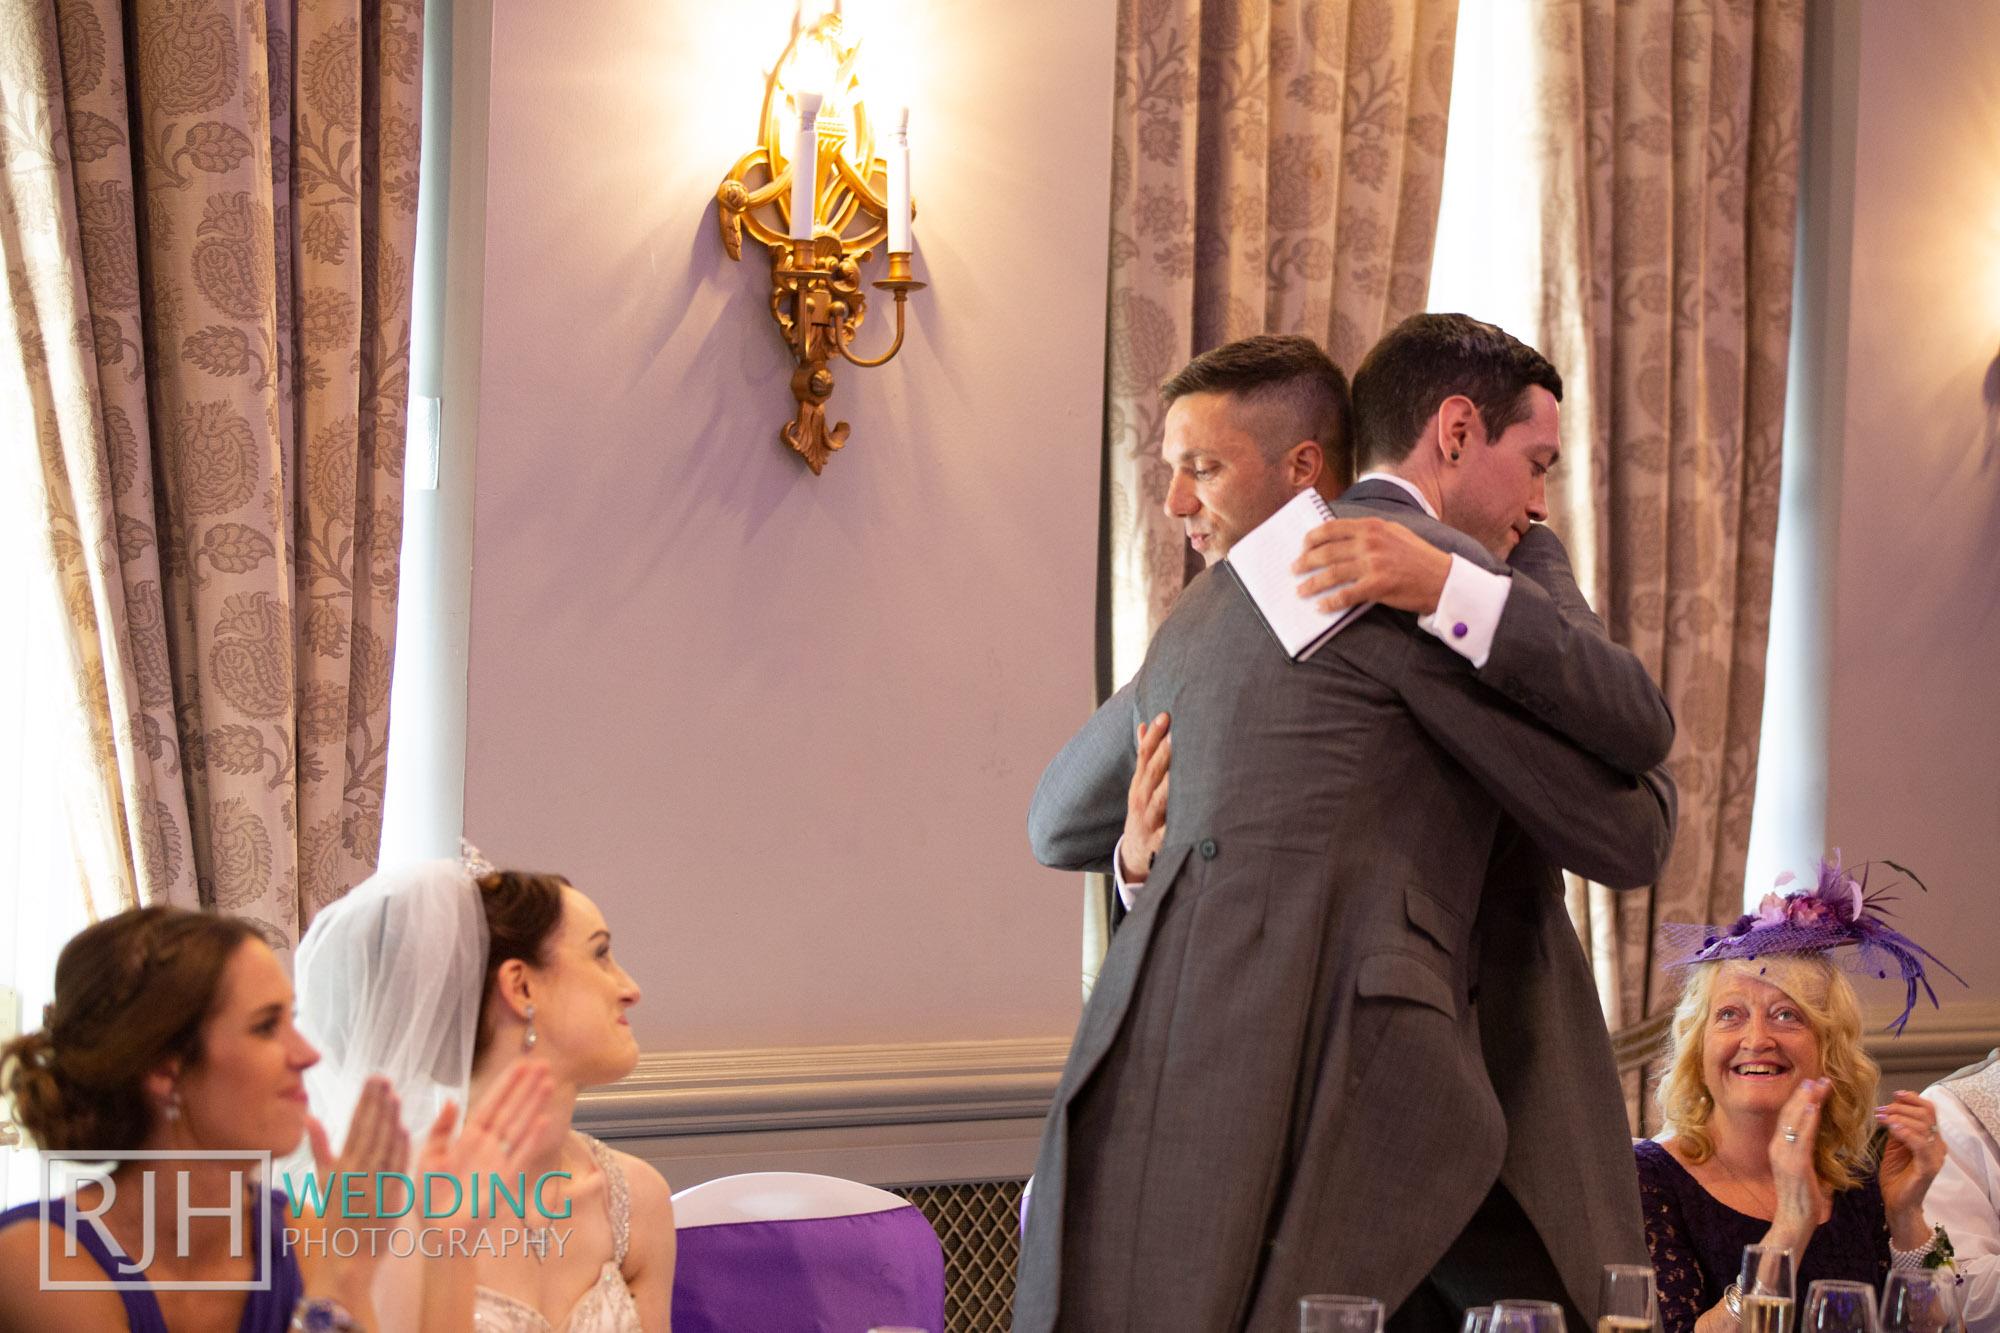 Oulton Hall Wedding Photography_Goodwill-Hall_041_RJH18056.jpg